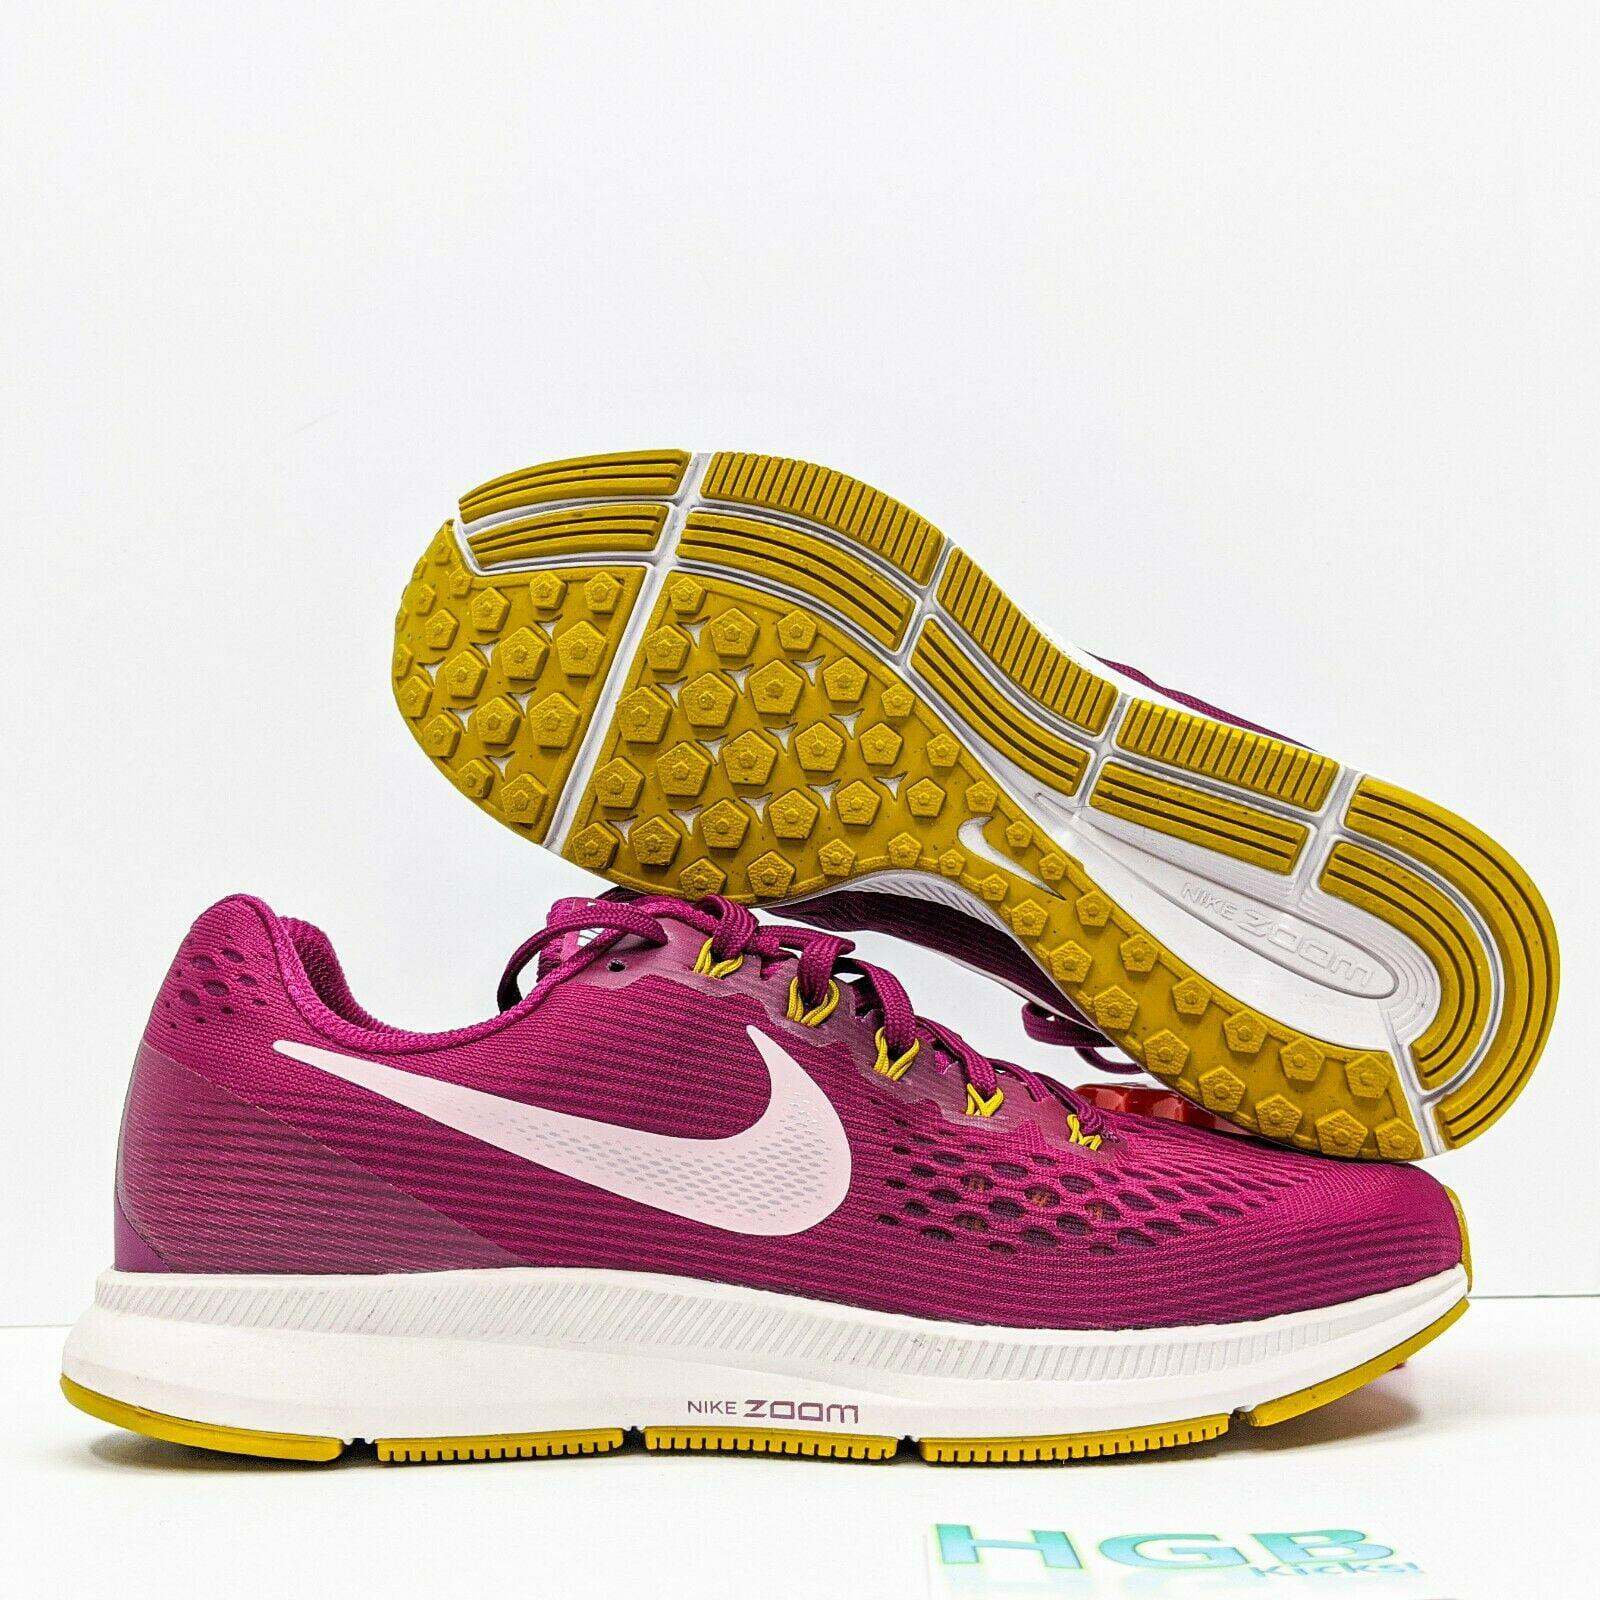 Appiccicoso Grande Barriera Corallina Gira e rigira  Nike - Nike Air Zoom Pegasus 34 Women's 880560-607 NIB - Walmart.com -  Walmart.com